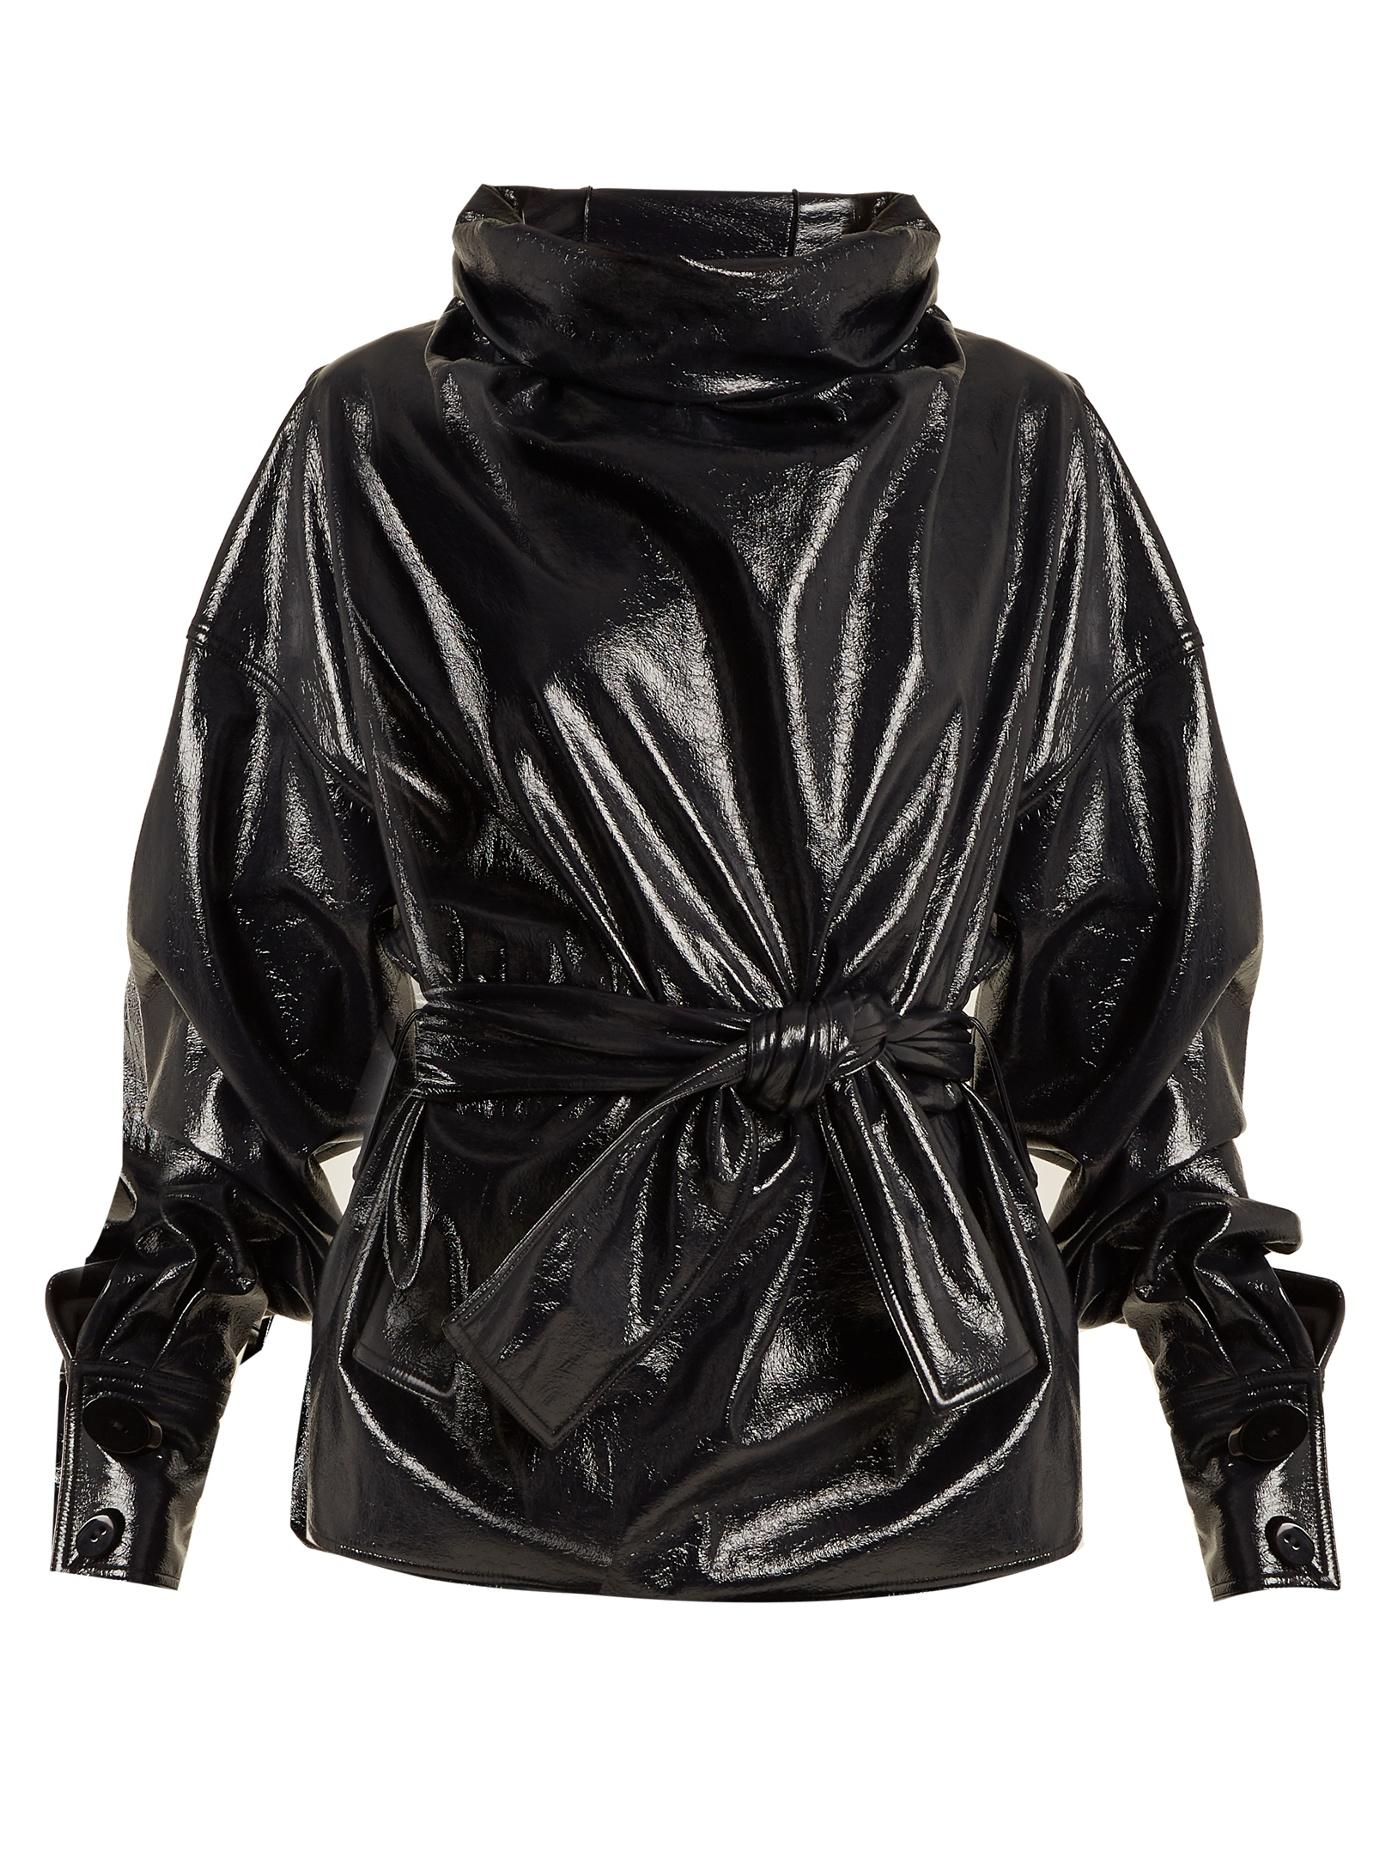 Wanda Nylon Funnel-Neck Tie-Waist Coated Cotton-Blend Top In Dark-Navy